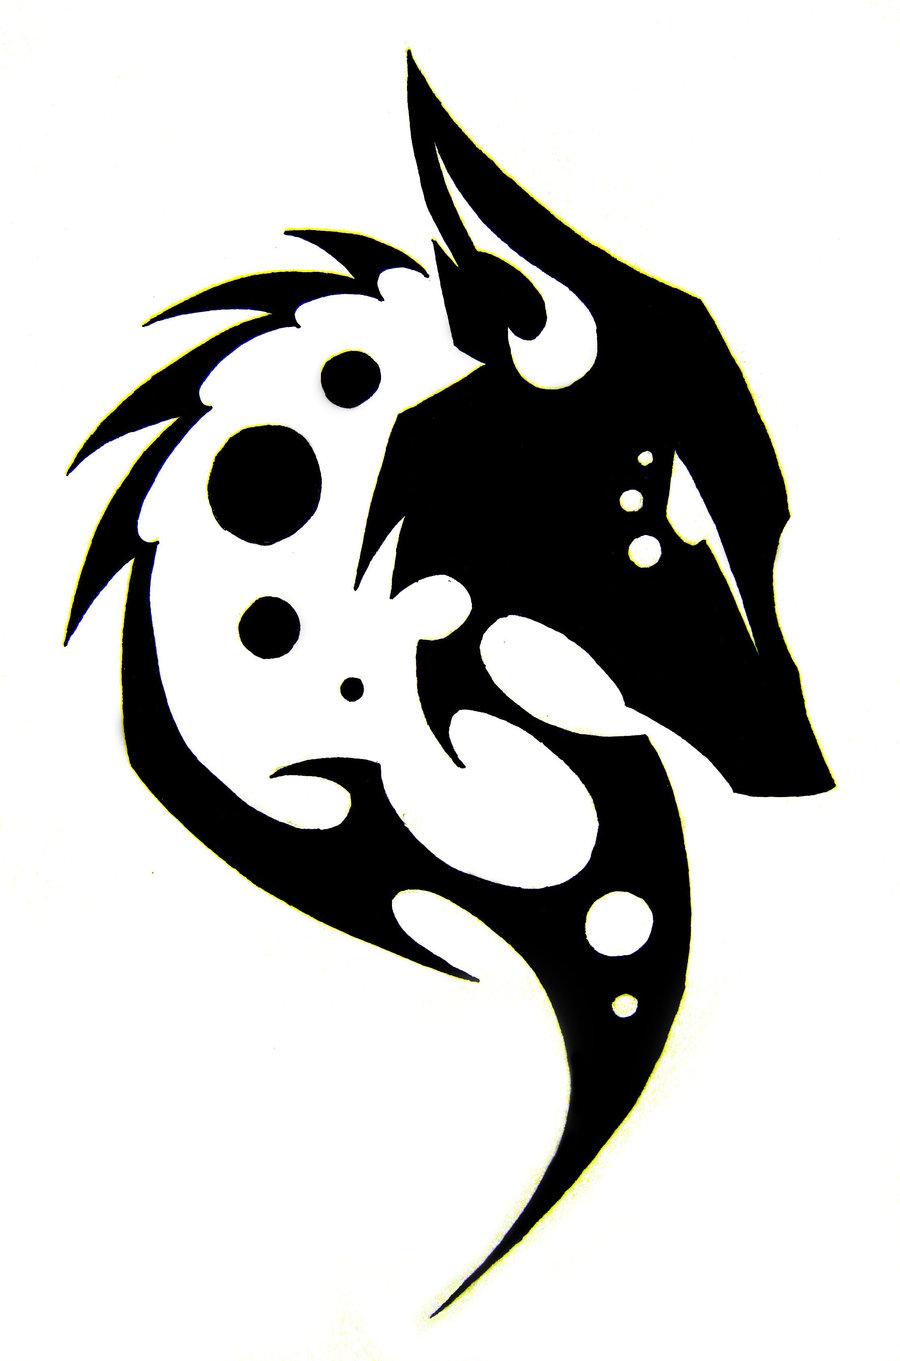 Wolf Head Tribal Tattoo Designs Free Image